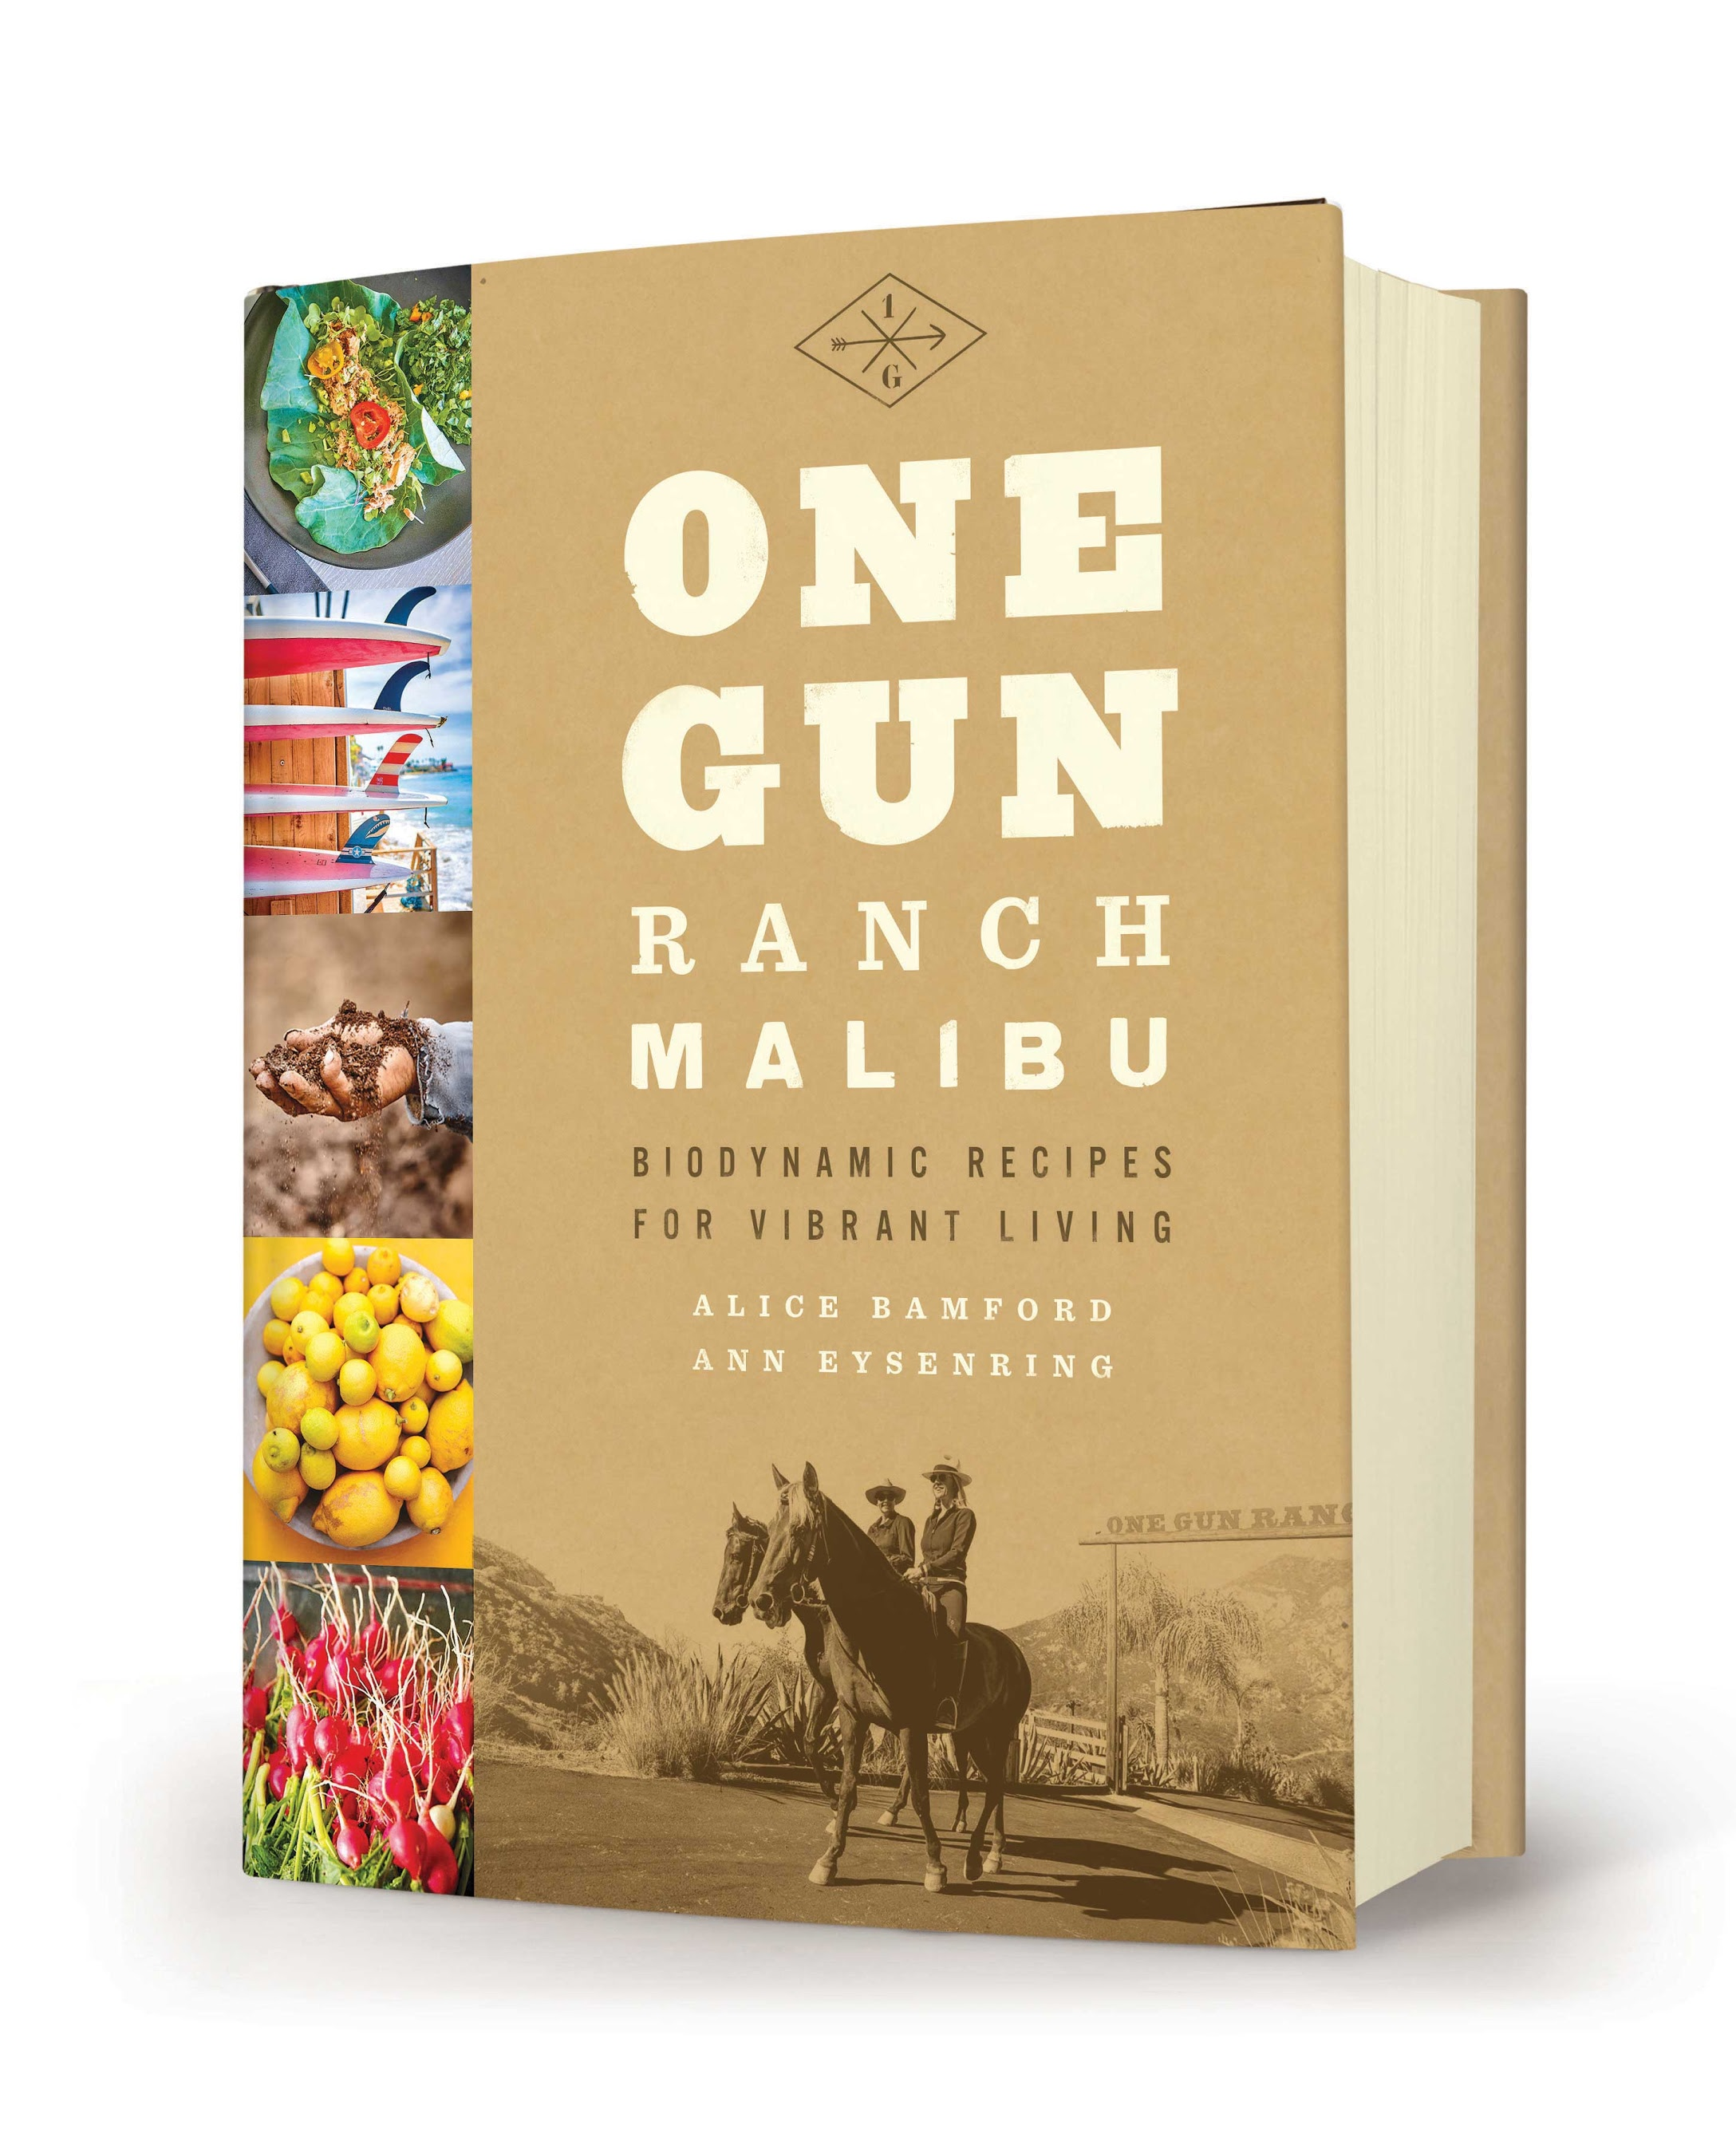 One Gun Ranch